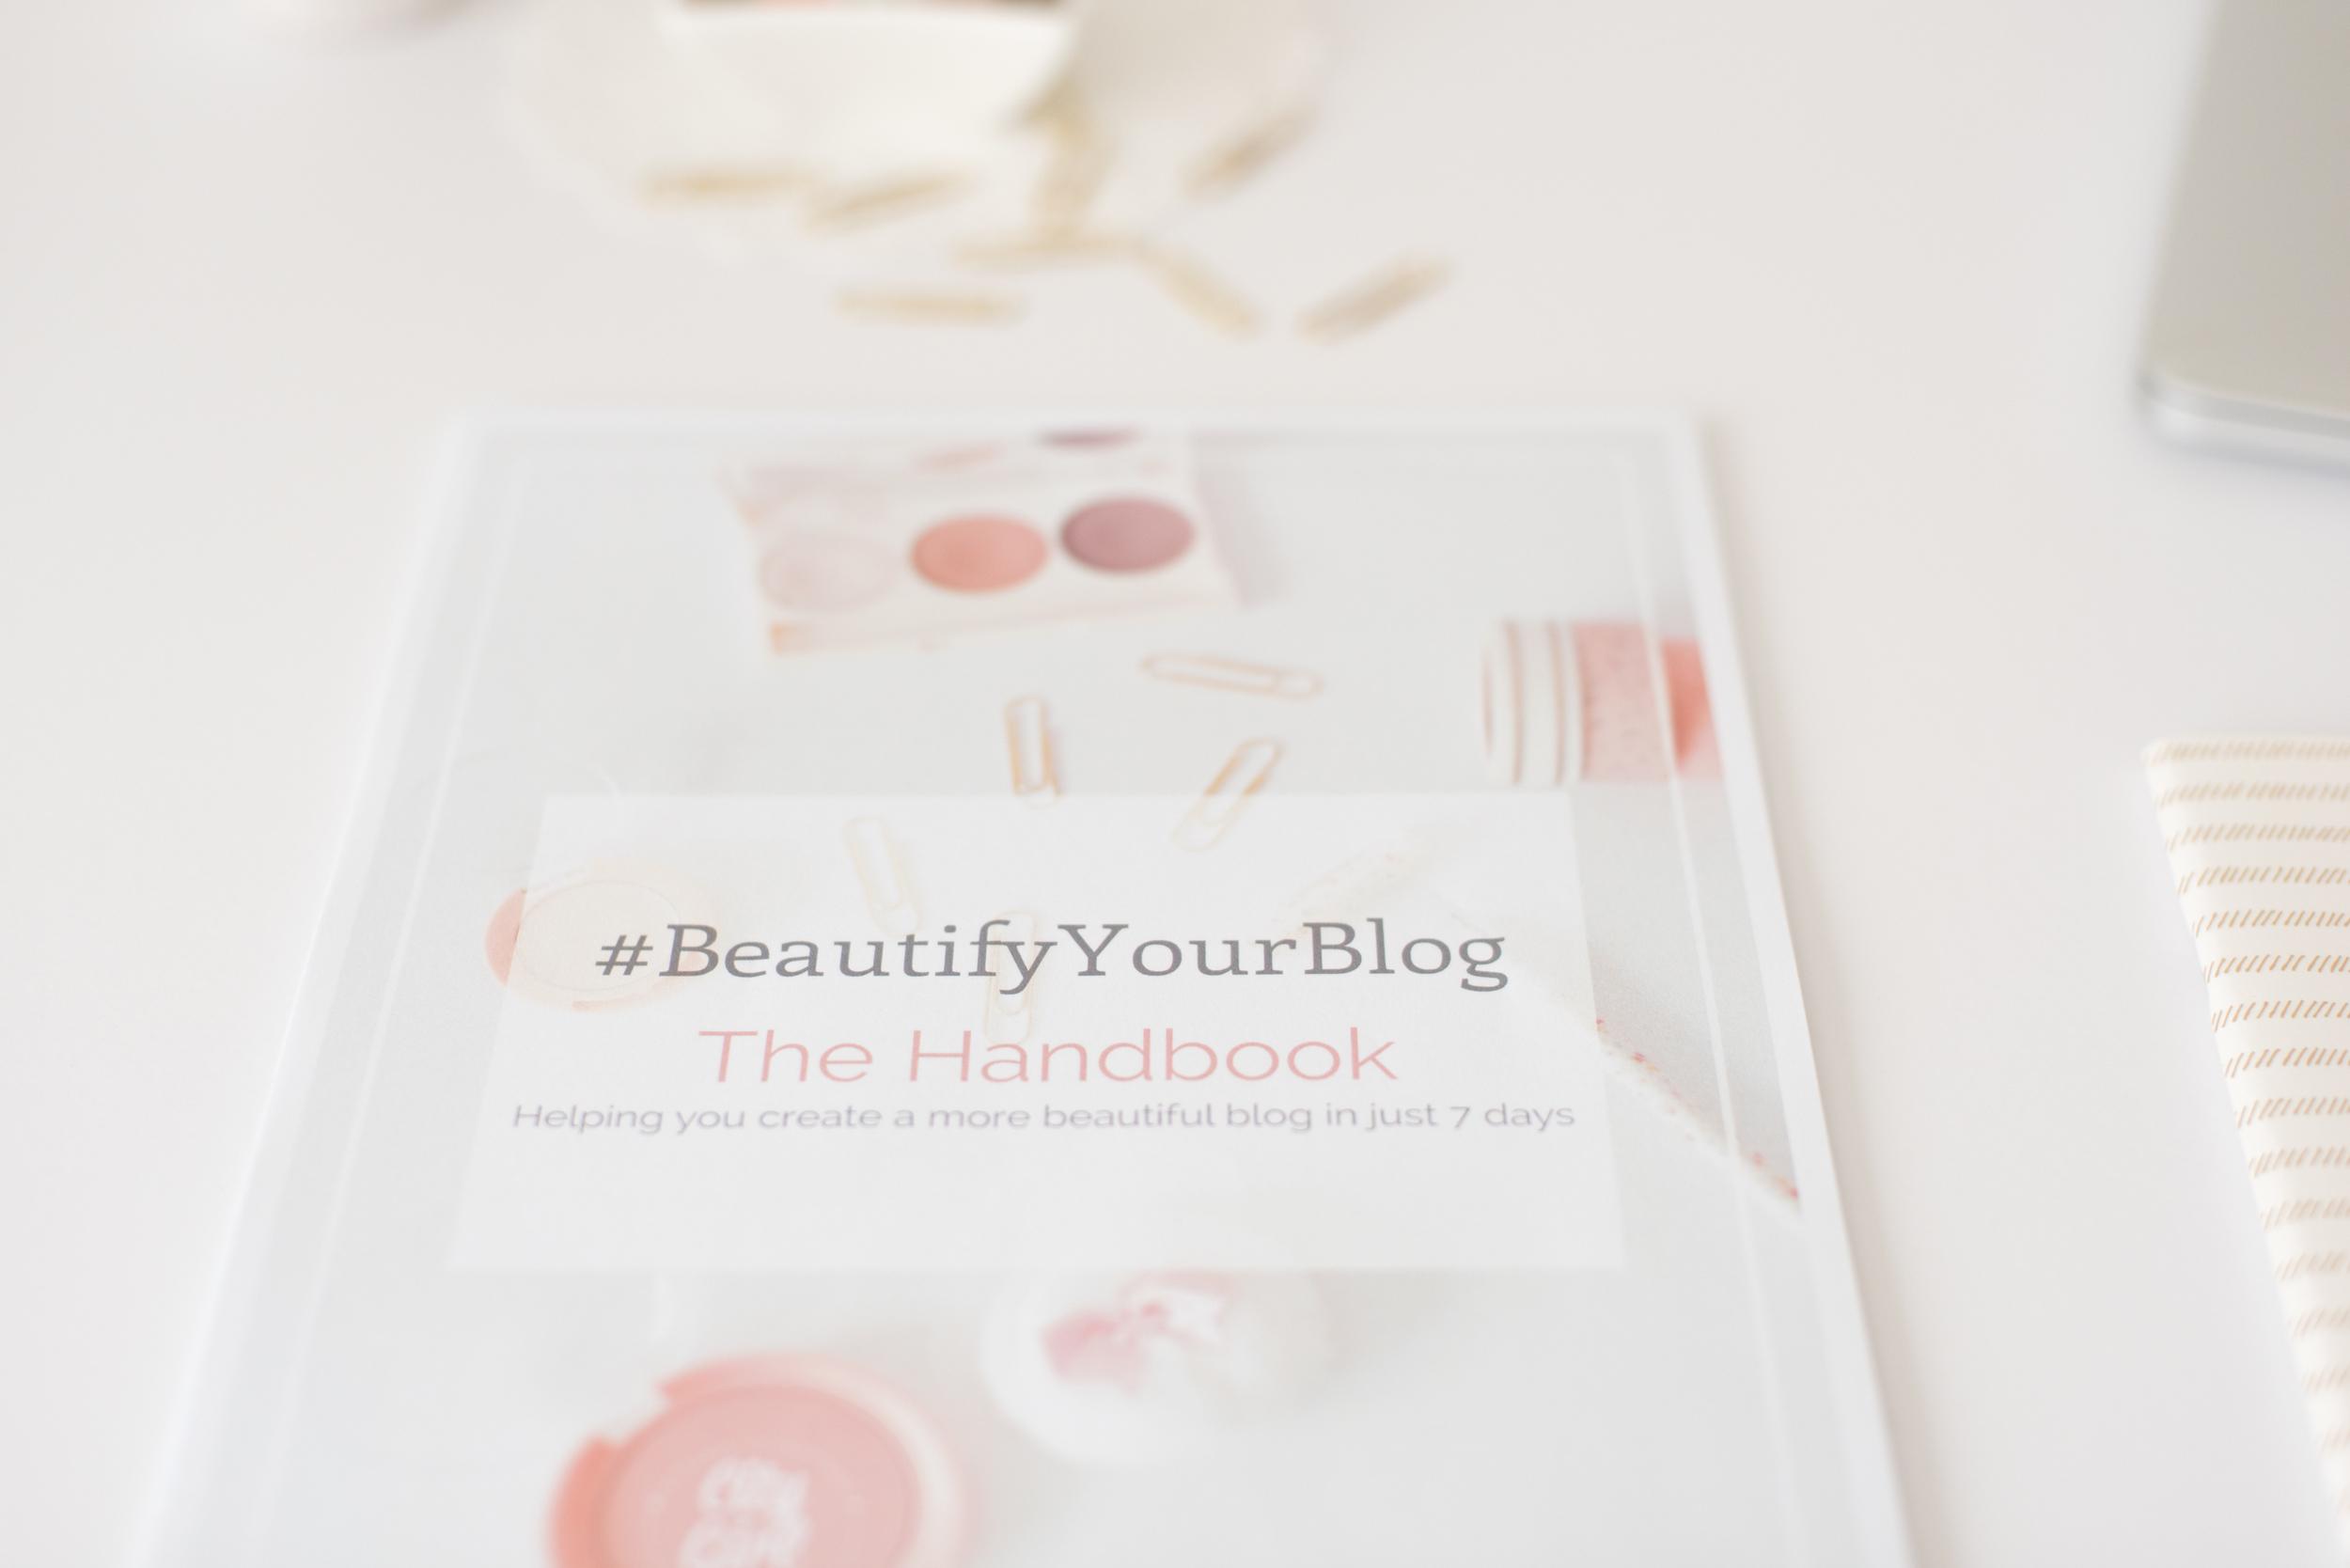 #BeautifyYourBlog Handguide for Bloggers byr Roxy Hutton of CityGirlSearching (12 of 25).JPG